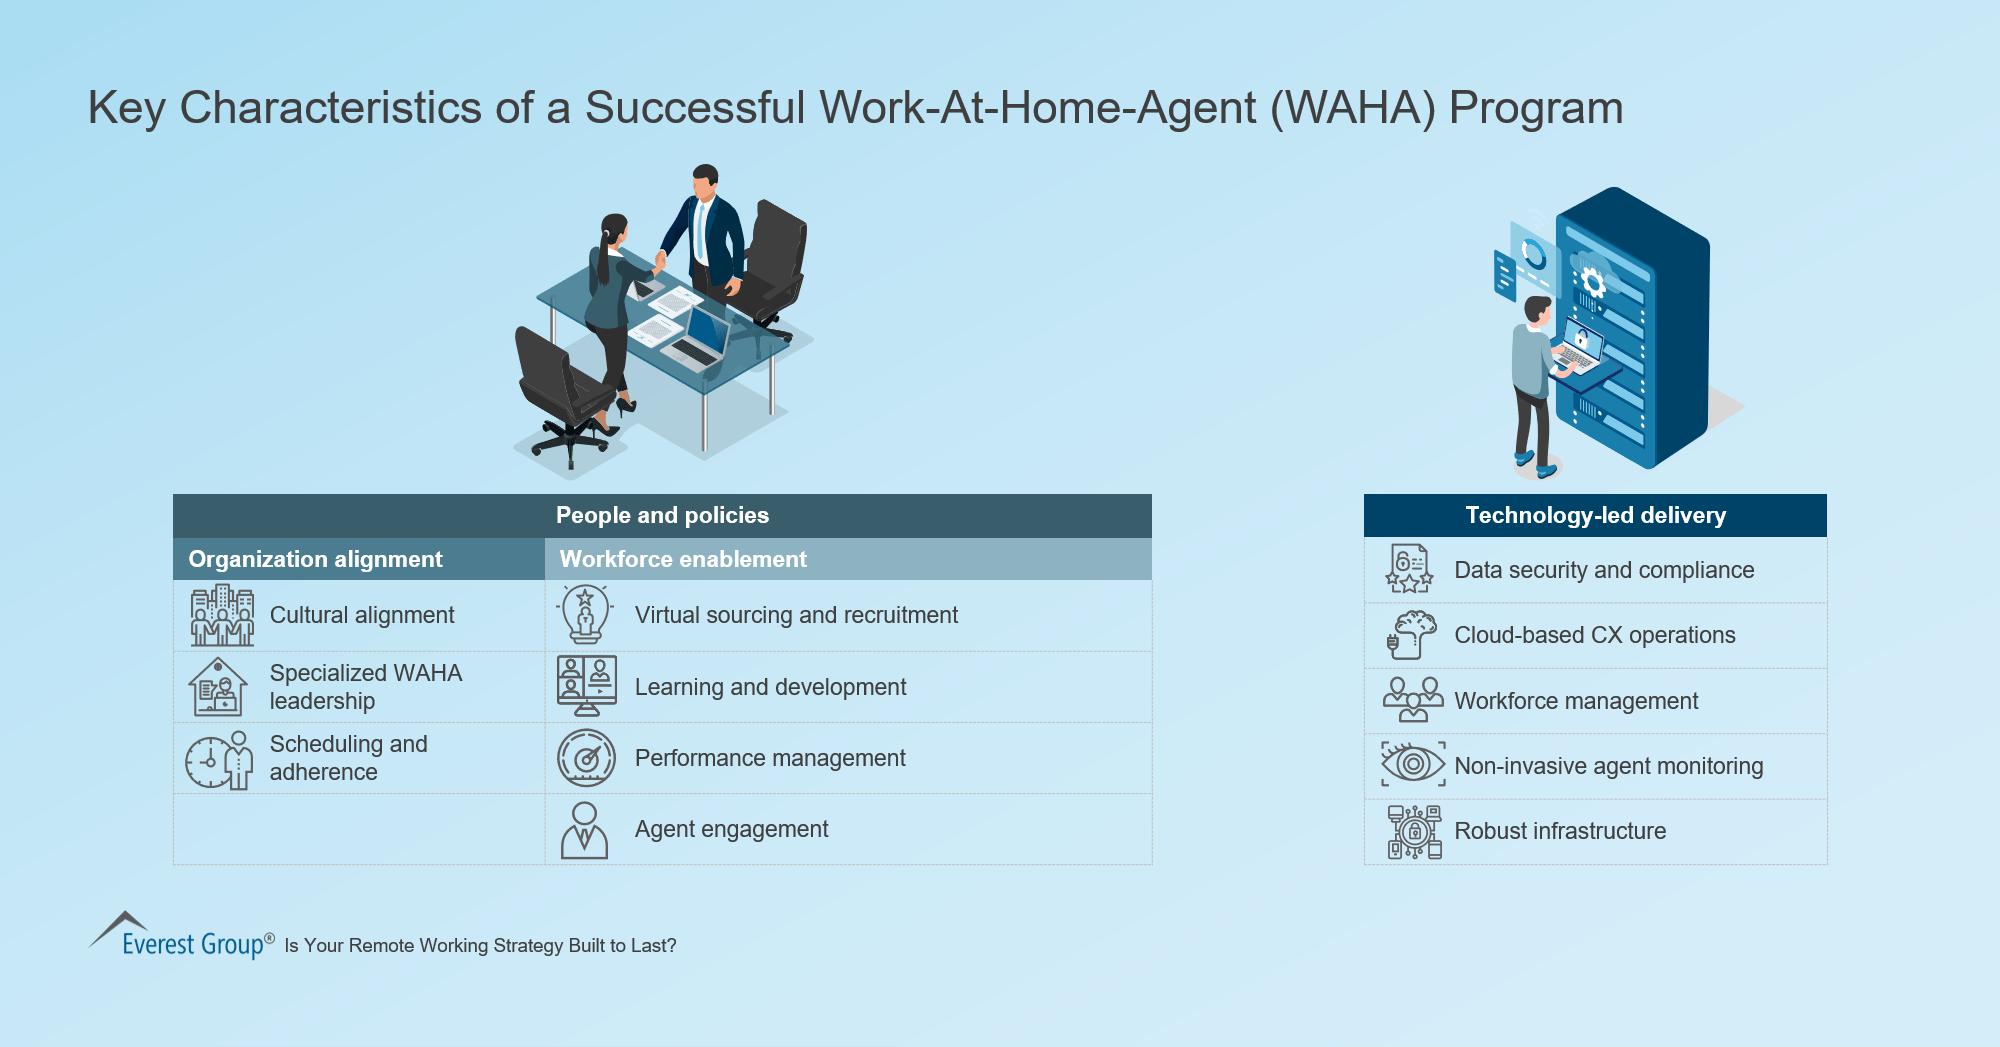 Key Characteristics of a Successful Work-At-Home-Agent (WAHA) Program